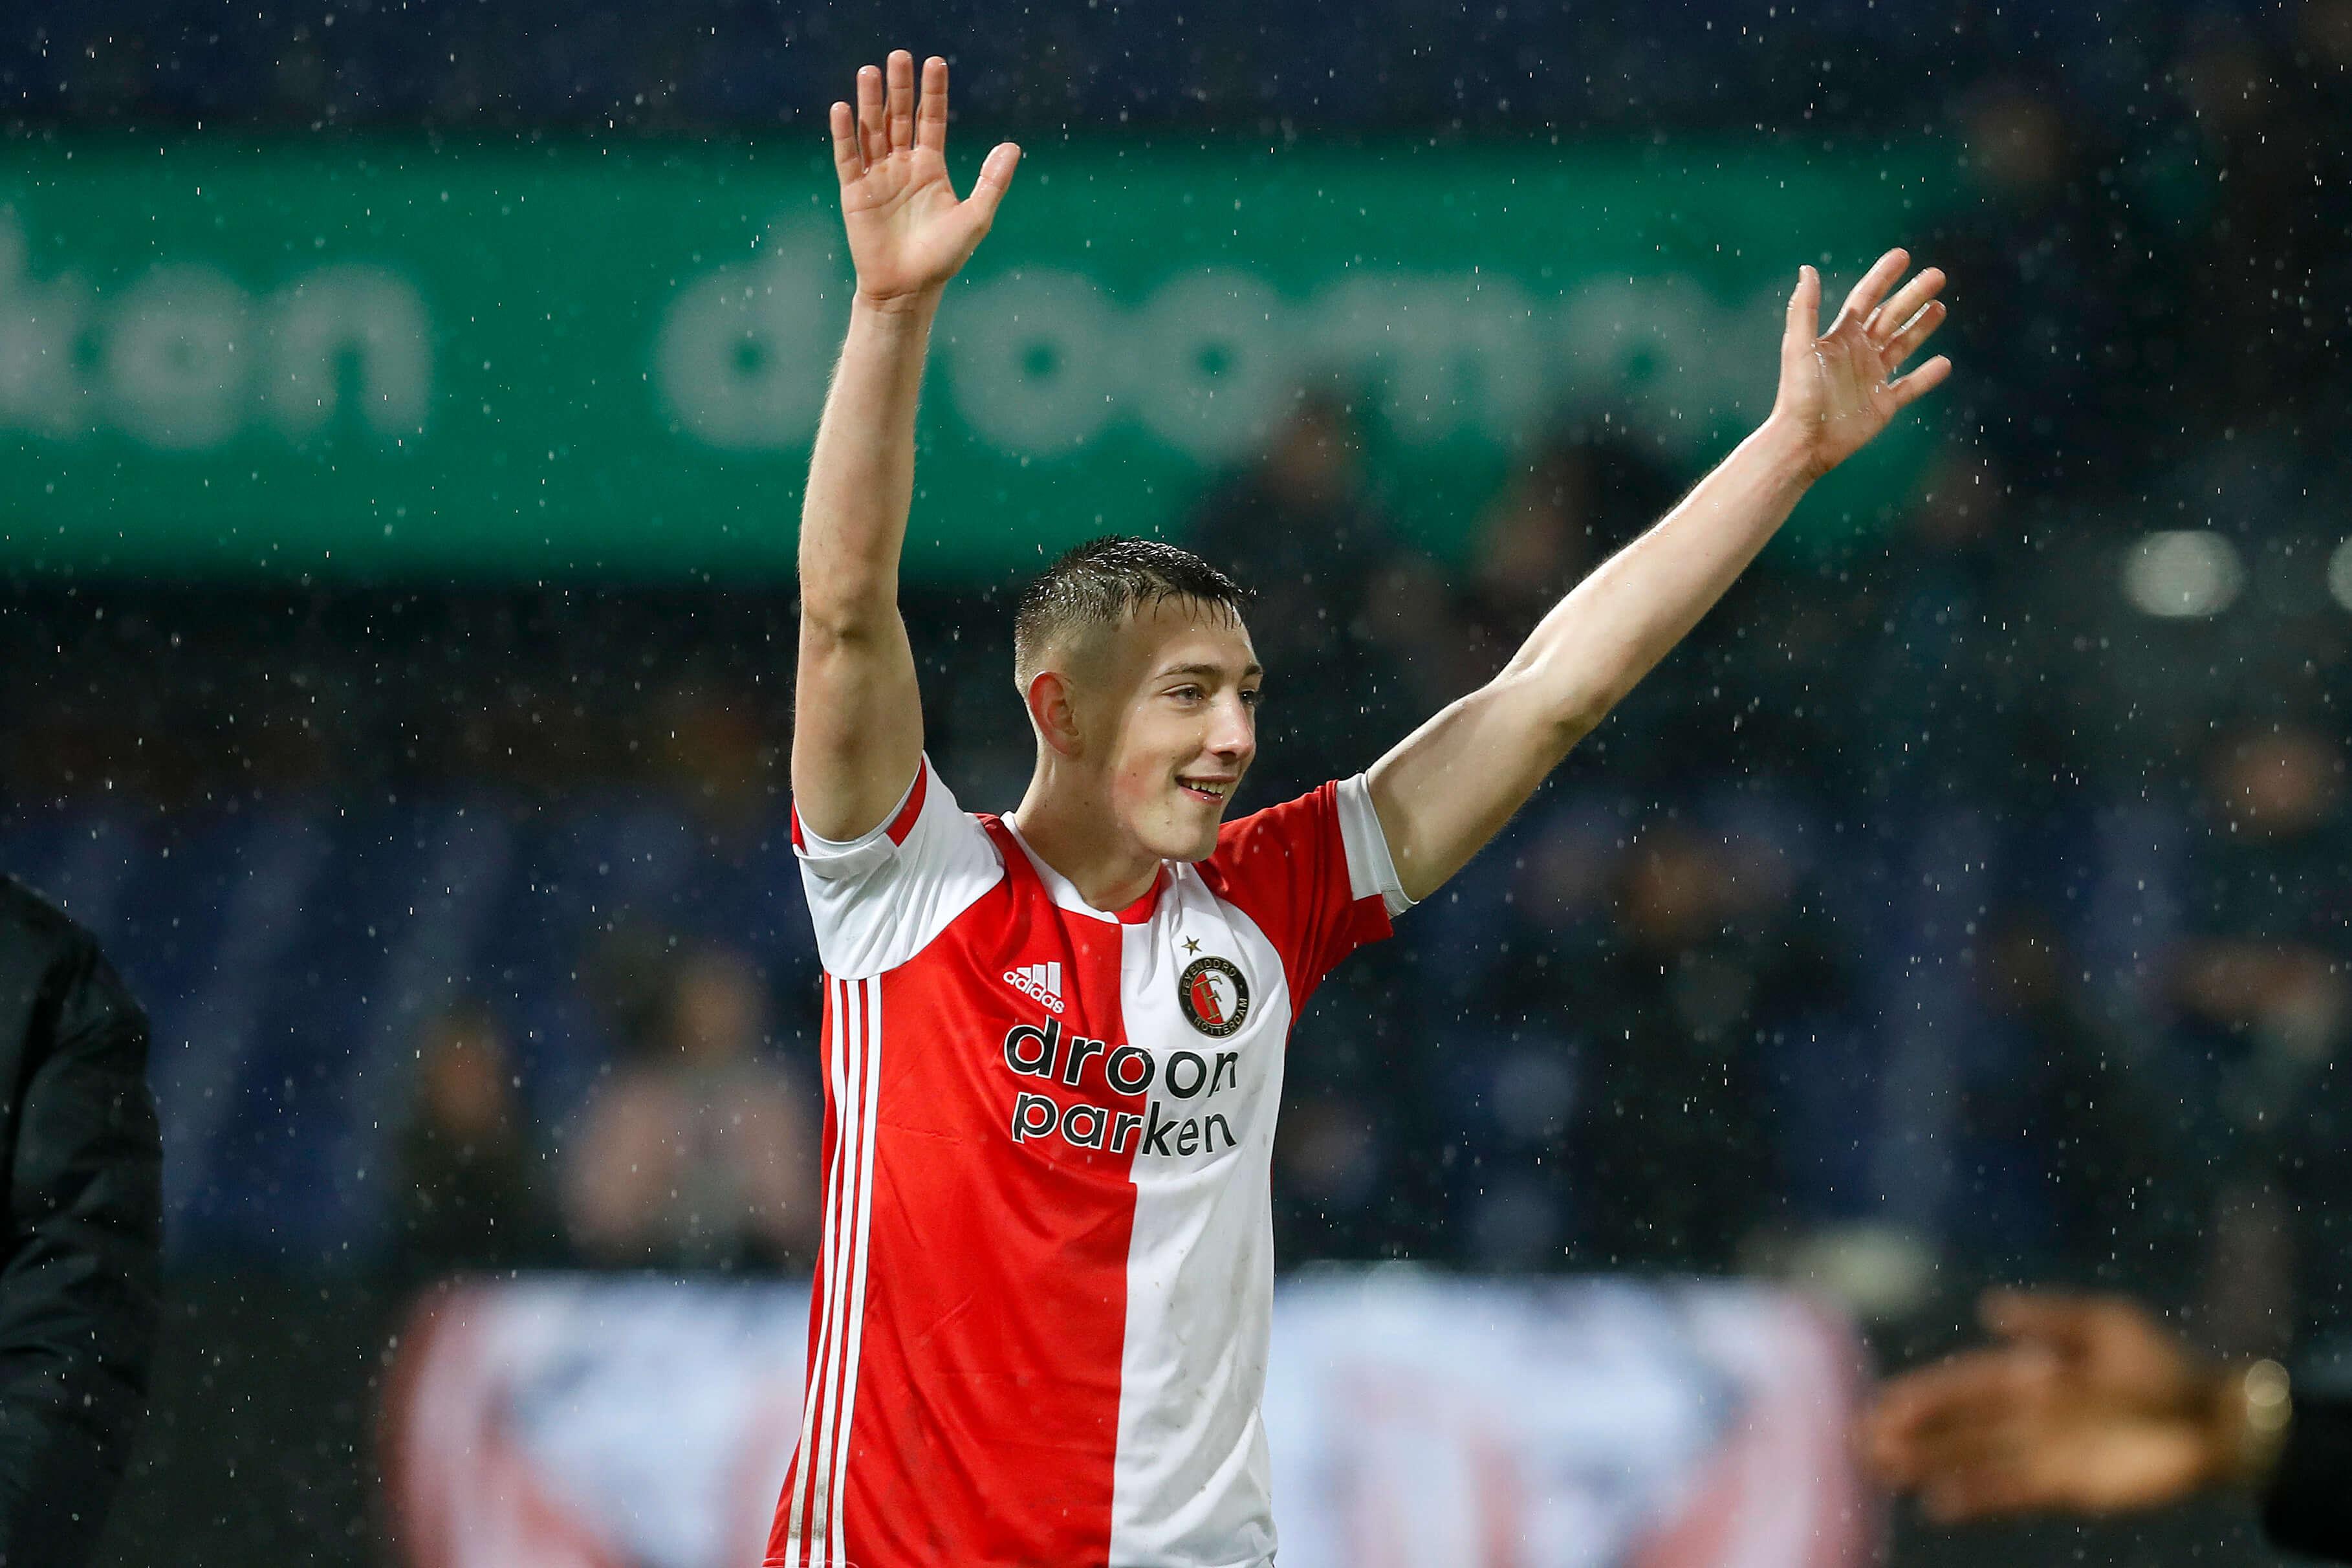 Róbert Boženík beste Slowaakse voetballer onder 21; image source: Pro Shots